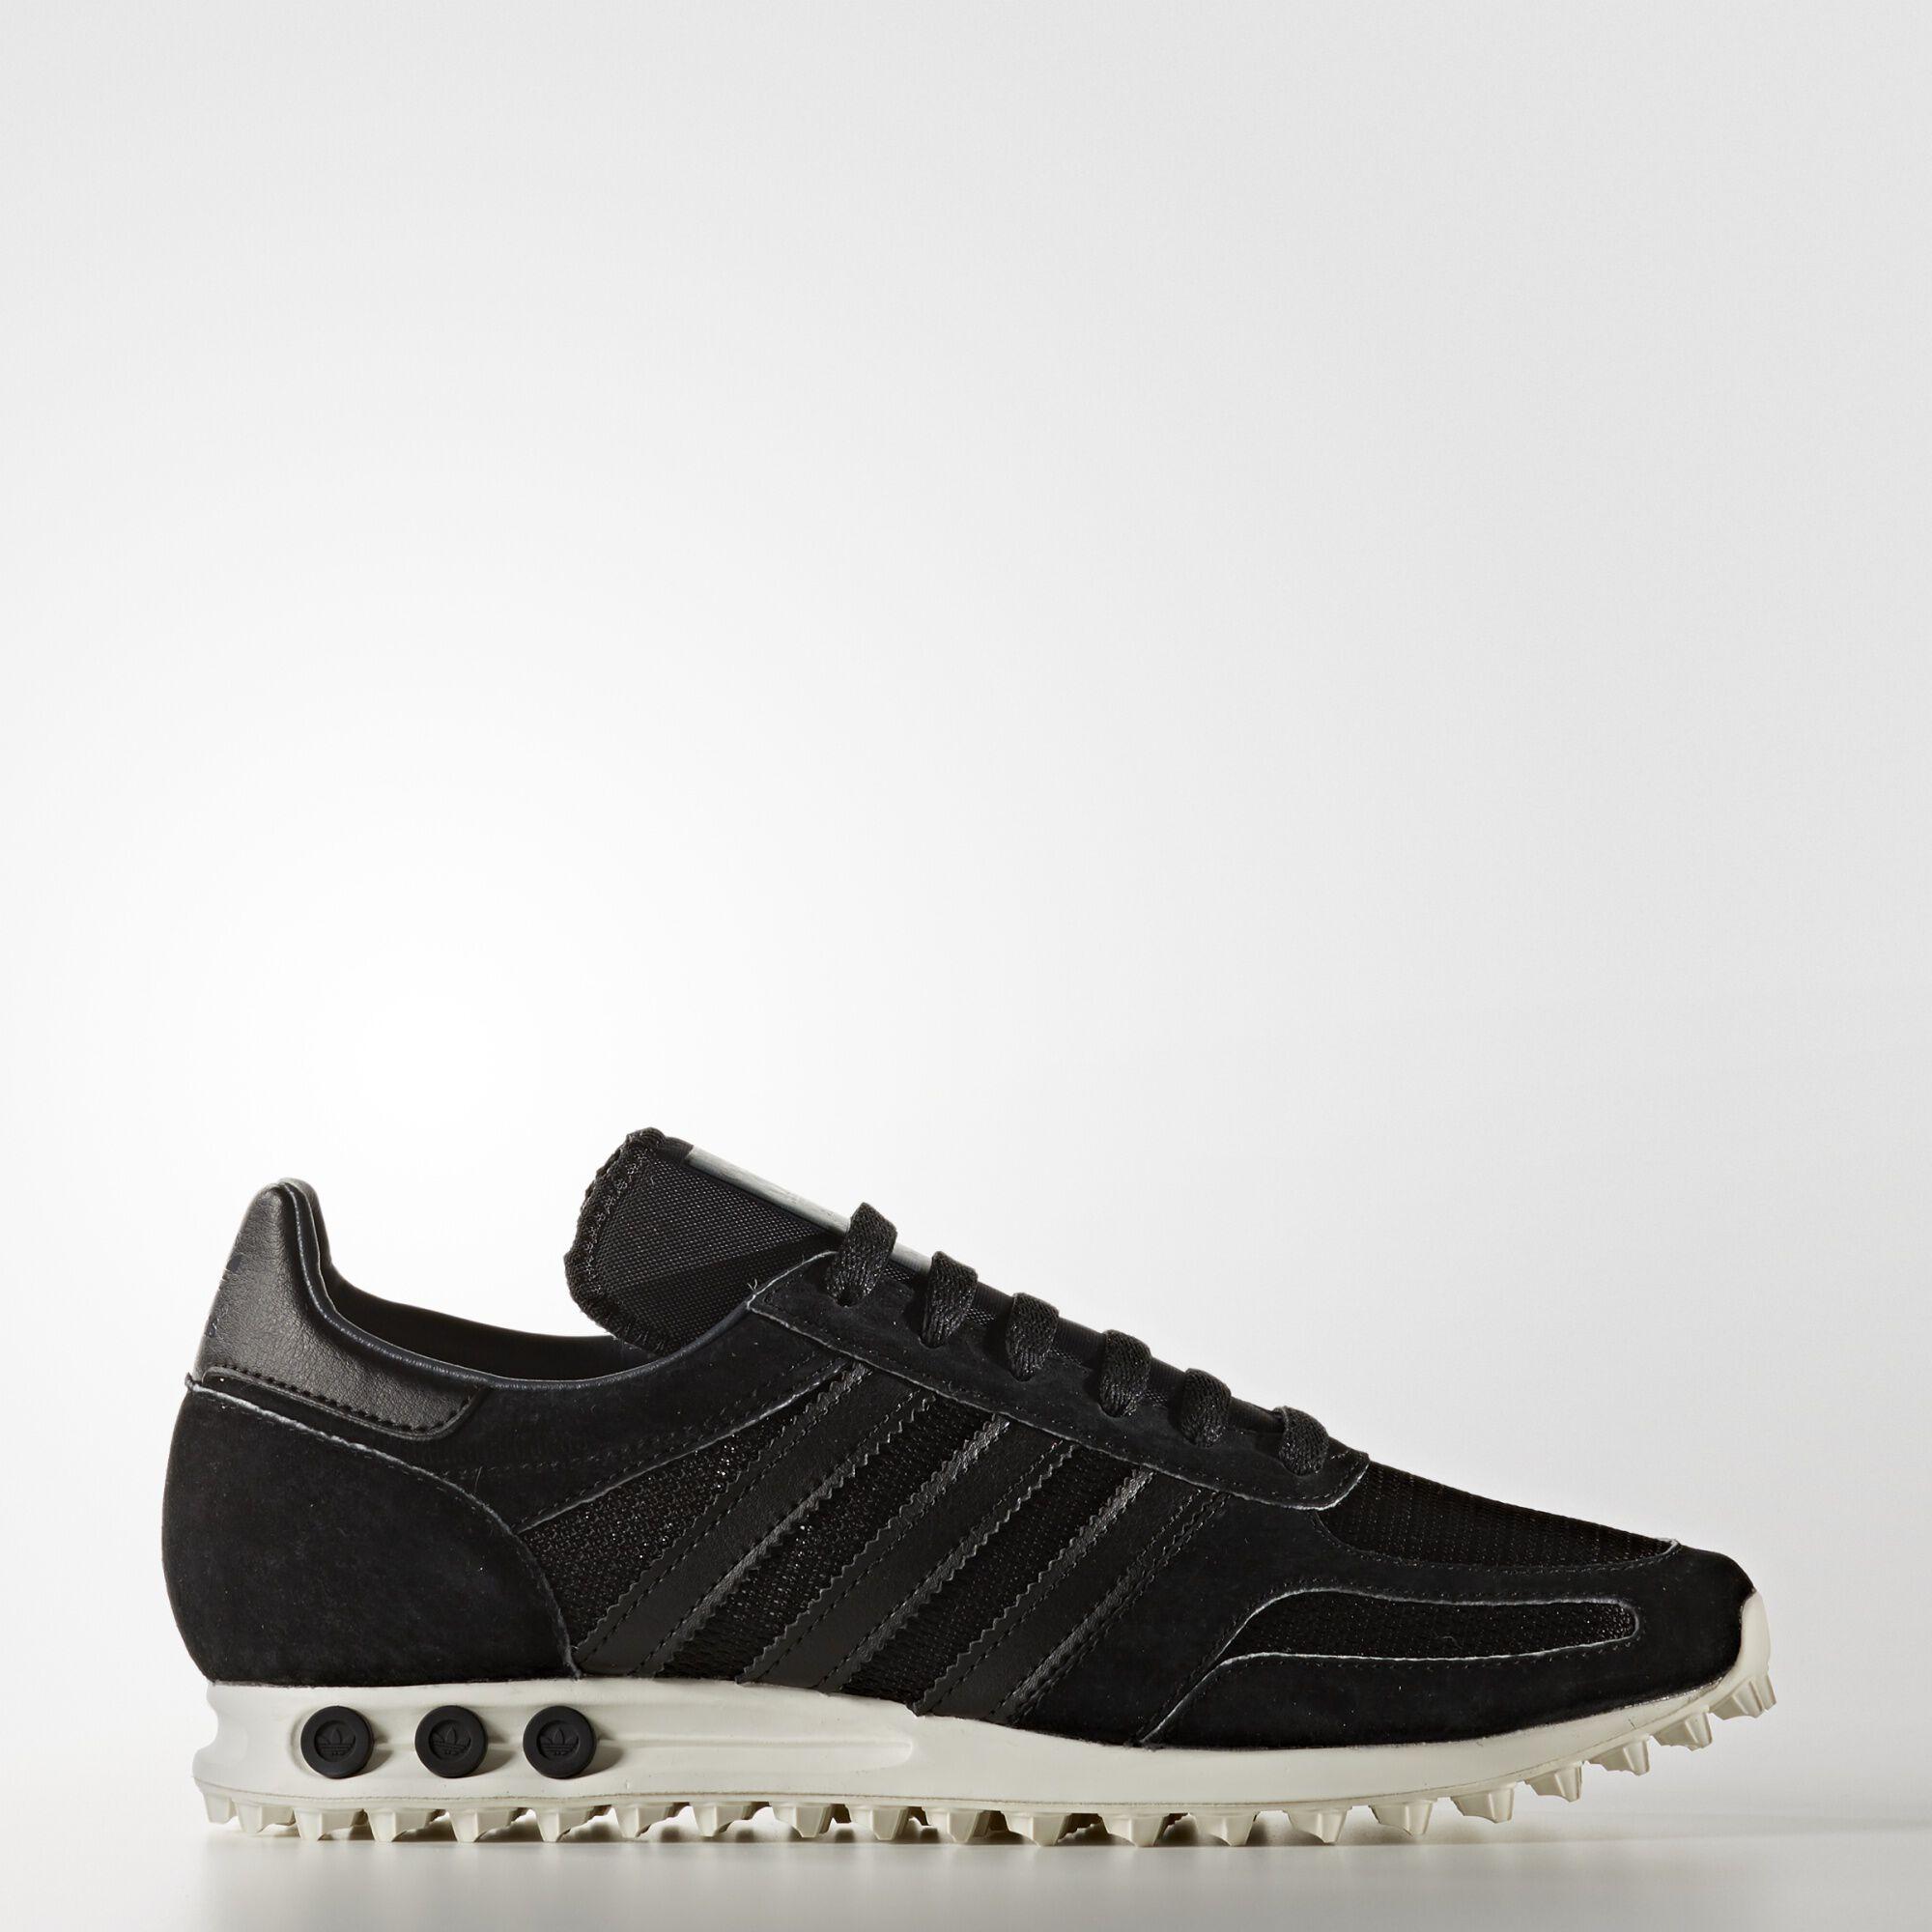 Adidas La Trainer All Black